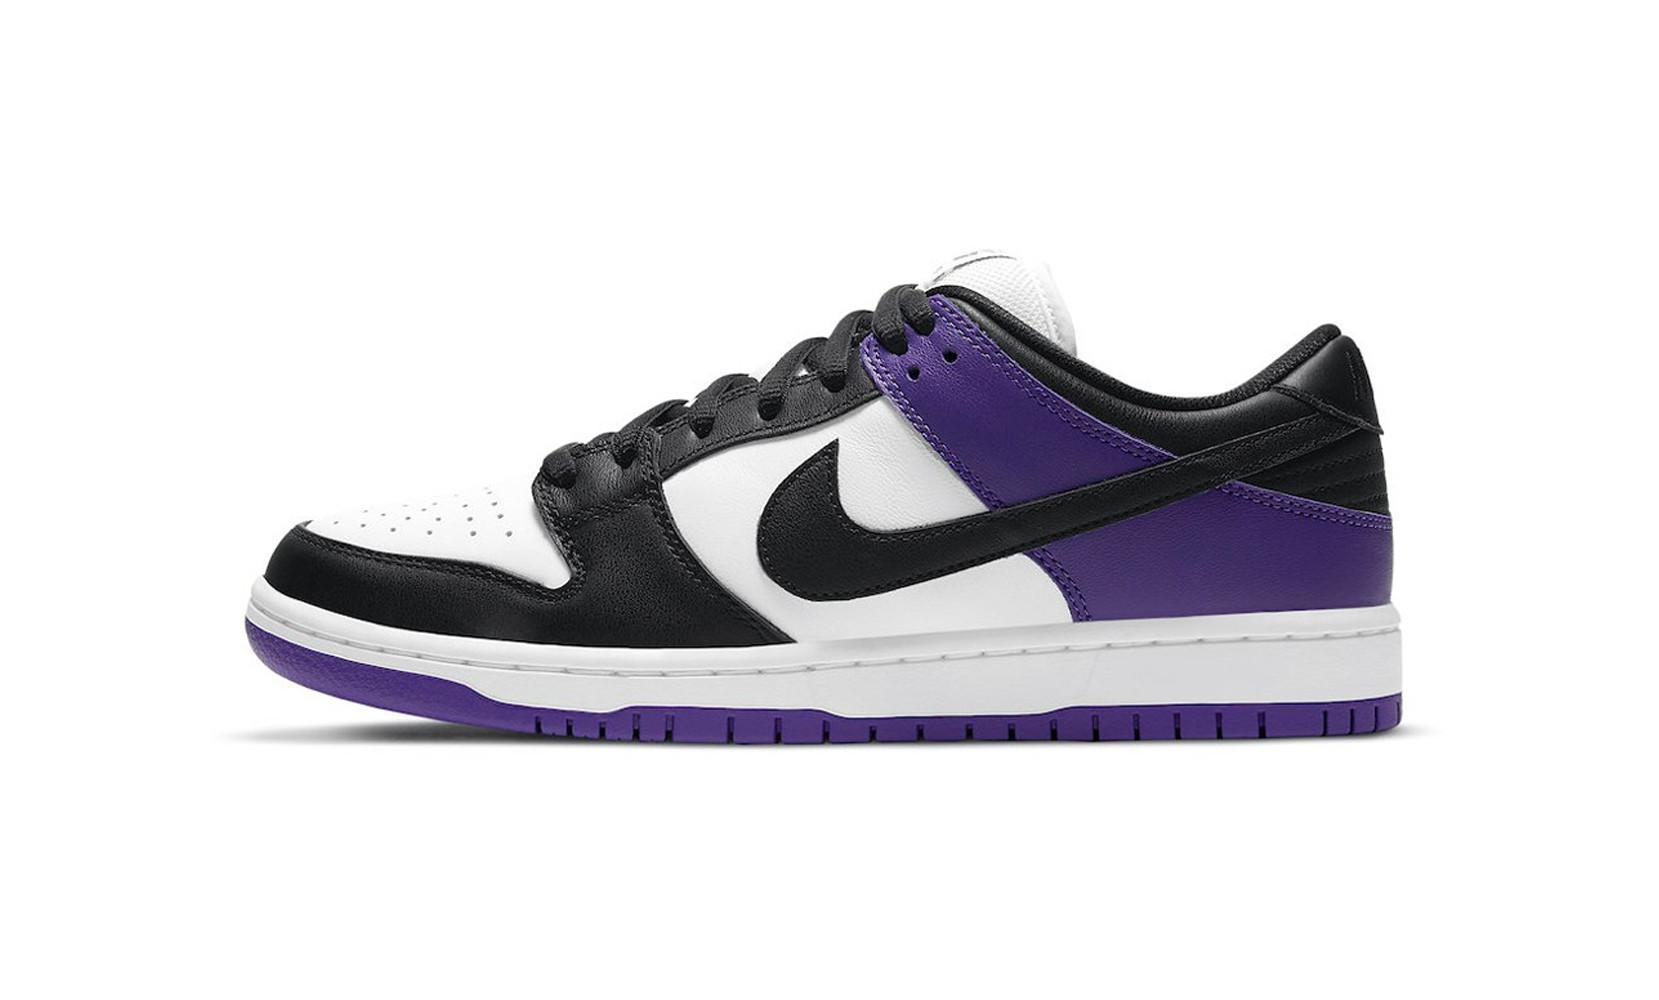 Nike Dunk Low Pro Court Purple